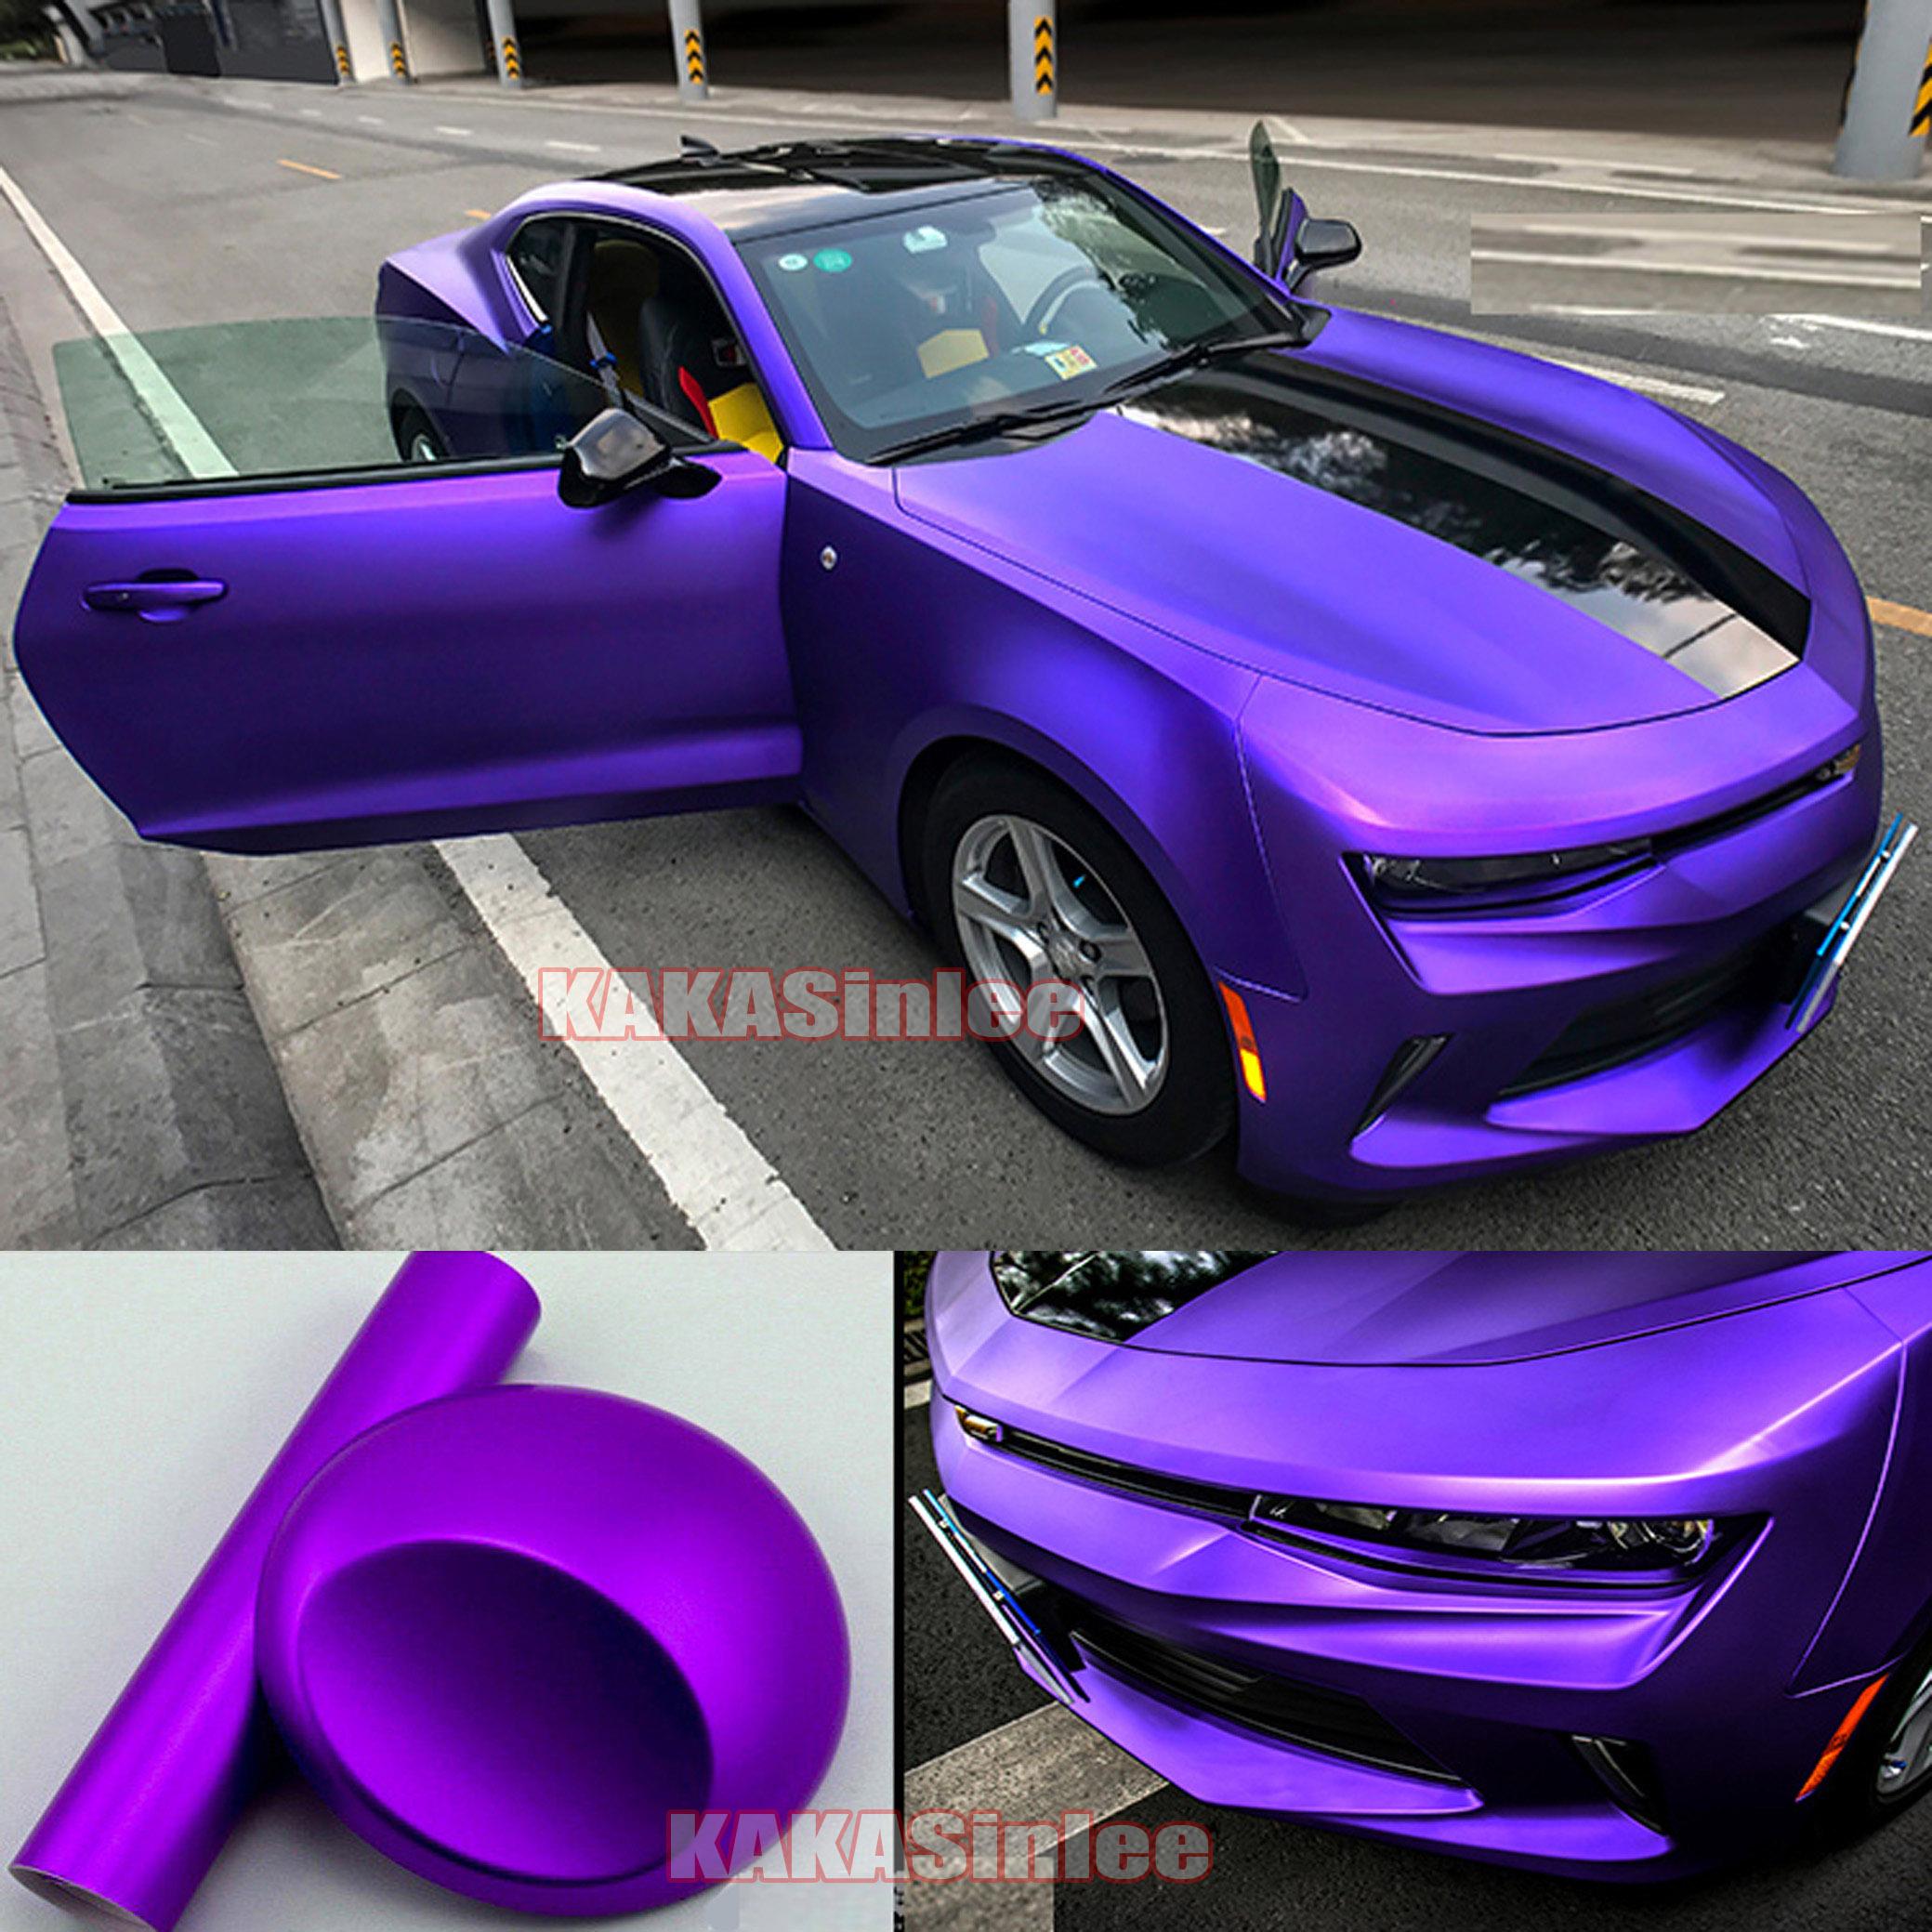 Metallic Matte Chrome Vinyl Wrap Film Sticker Car Hood Bumper Laptop Purple DIY